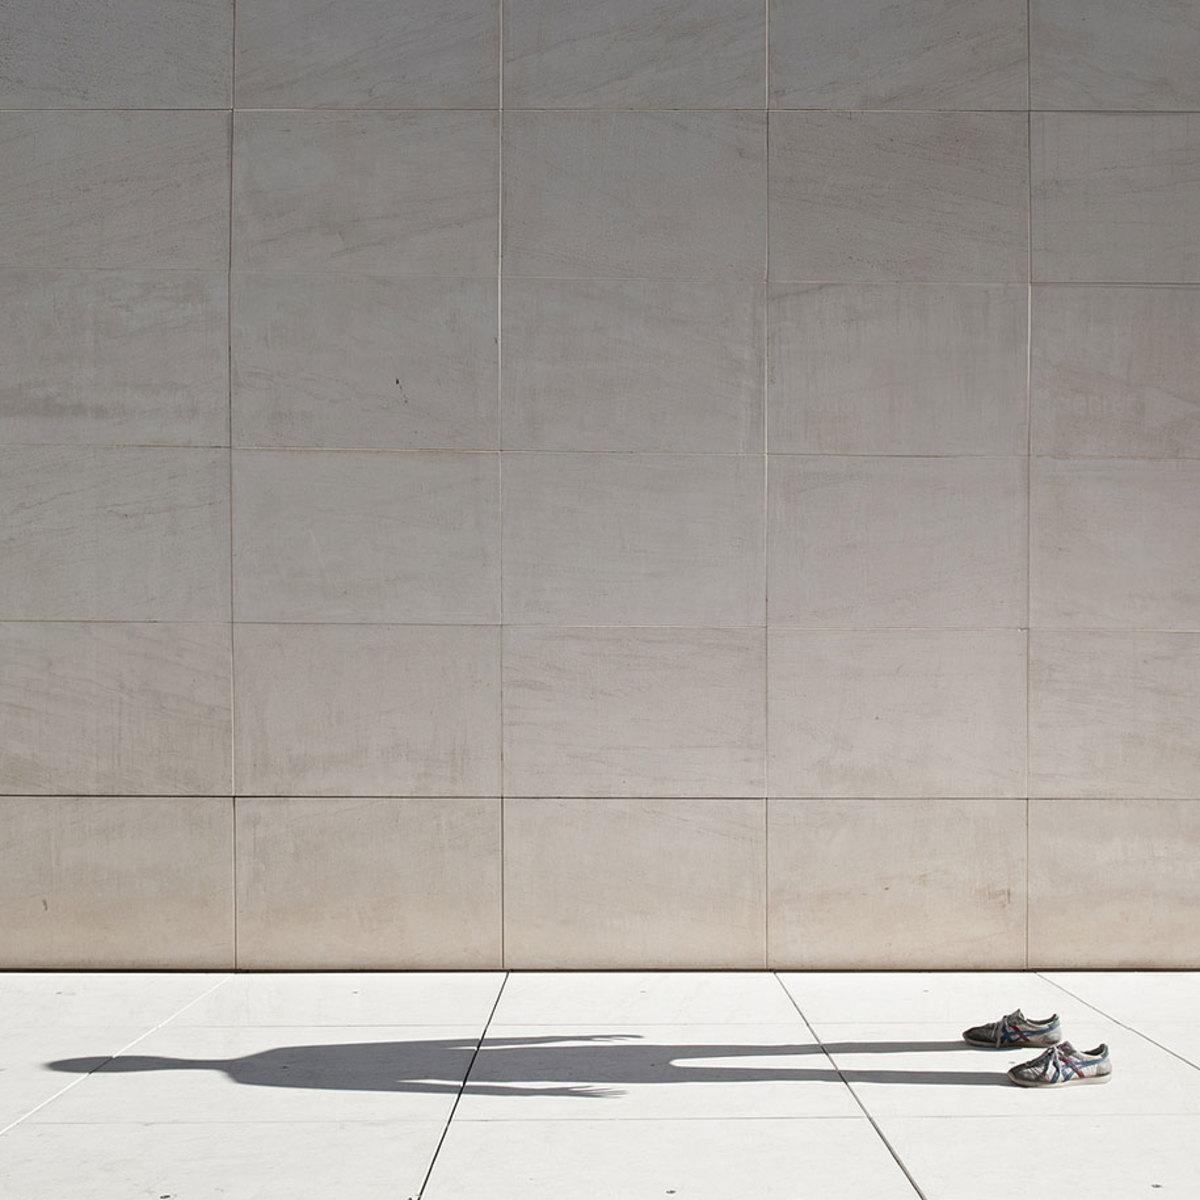 invisible-man-shadows-pol-ubeda-3